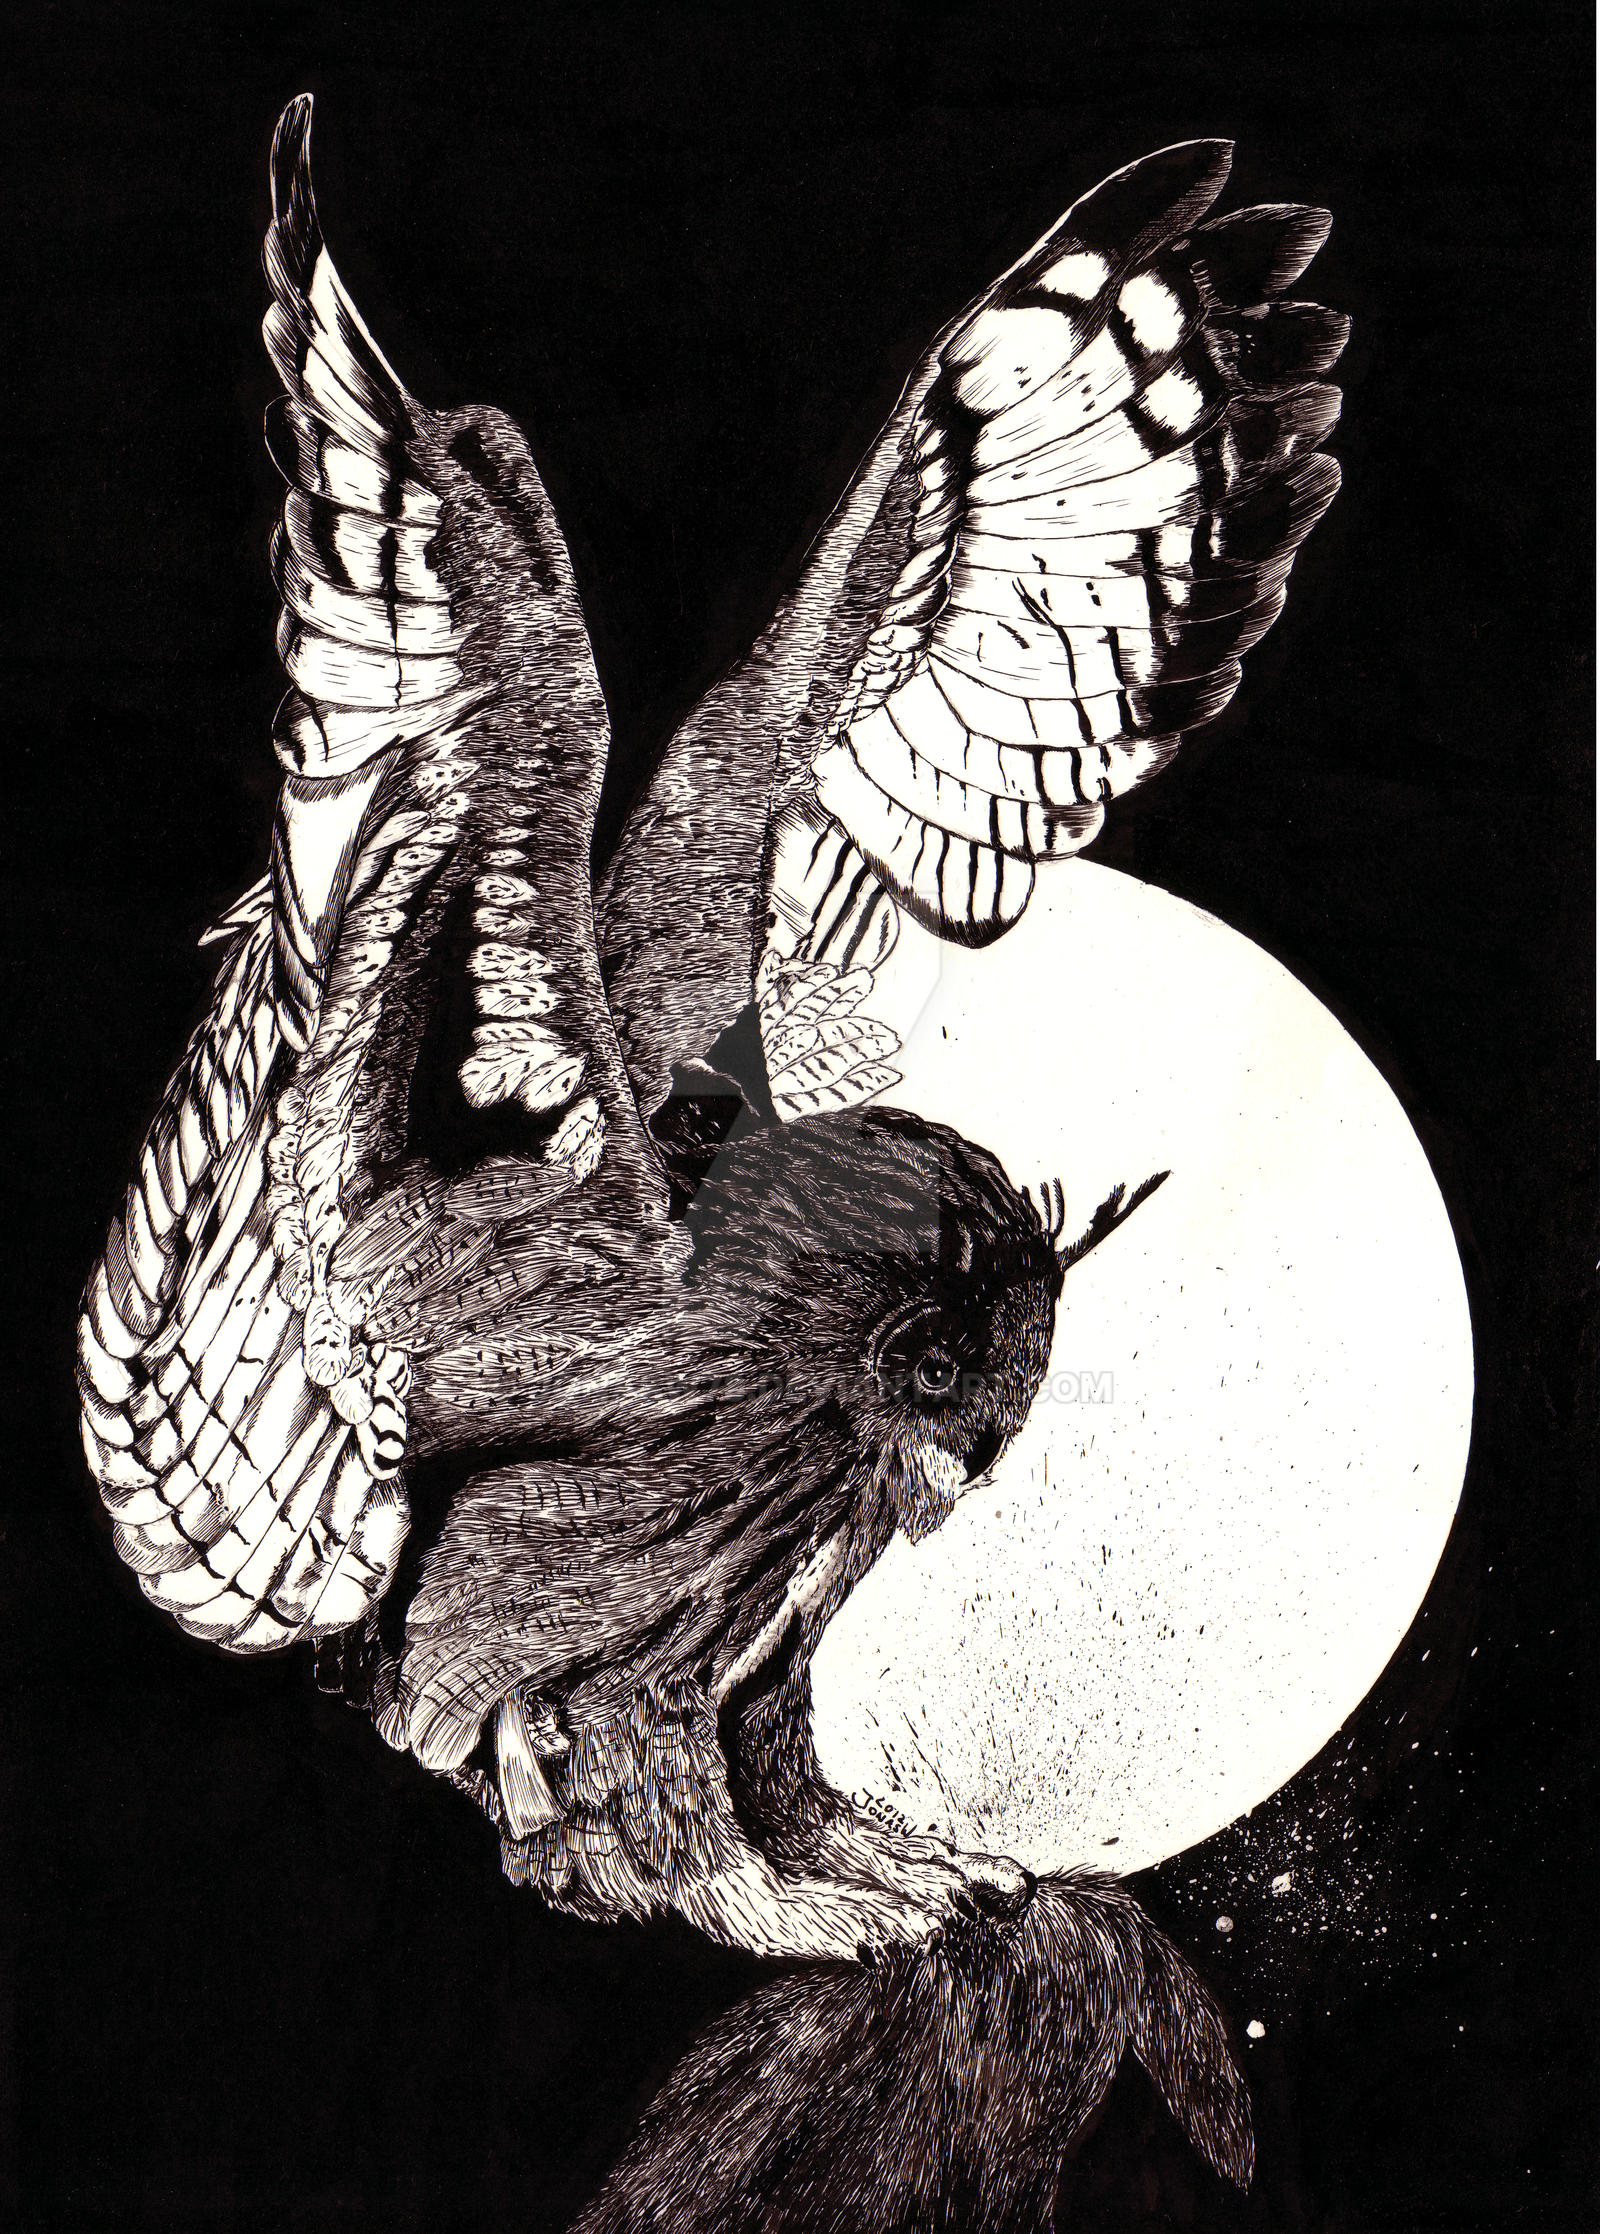 Bird of prey by JonasW78